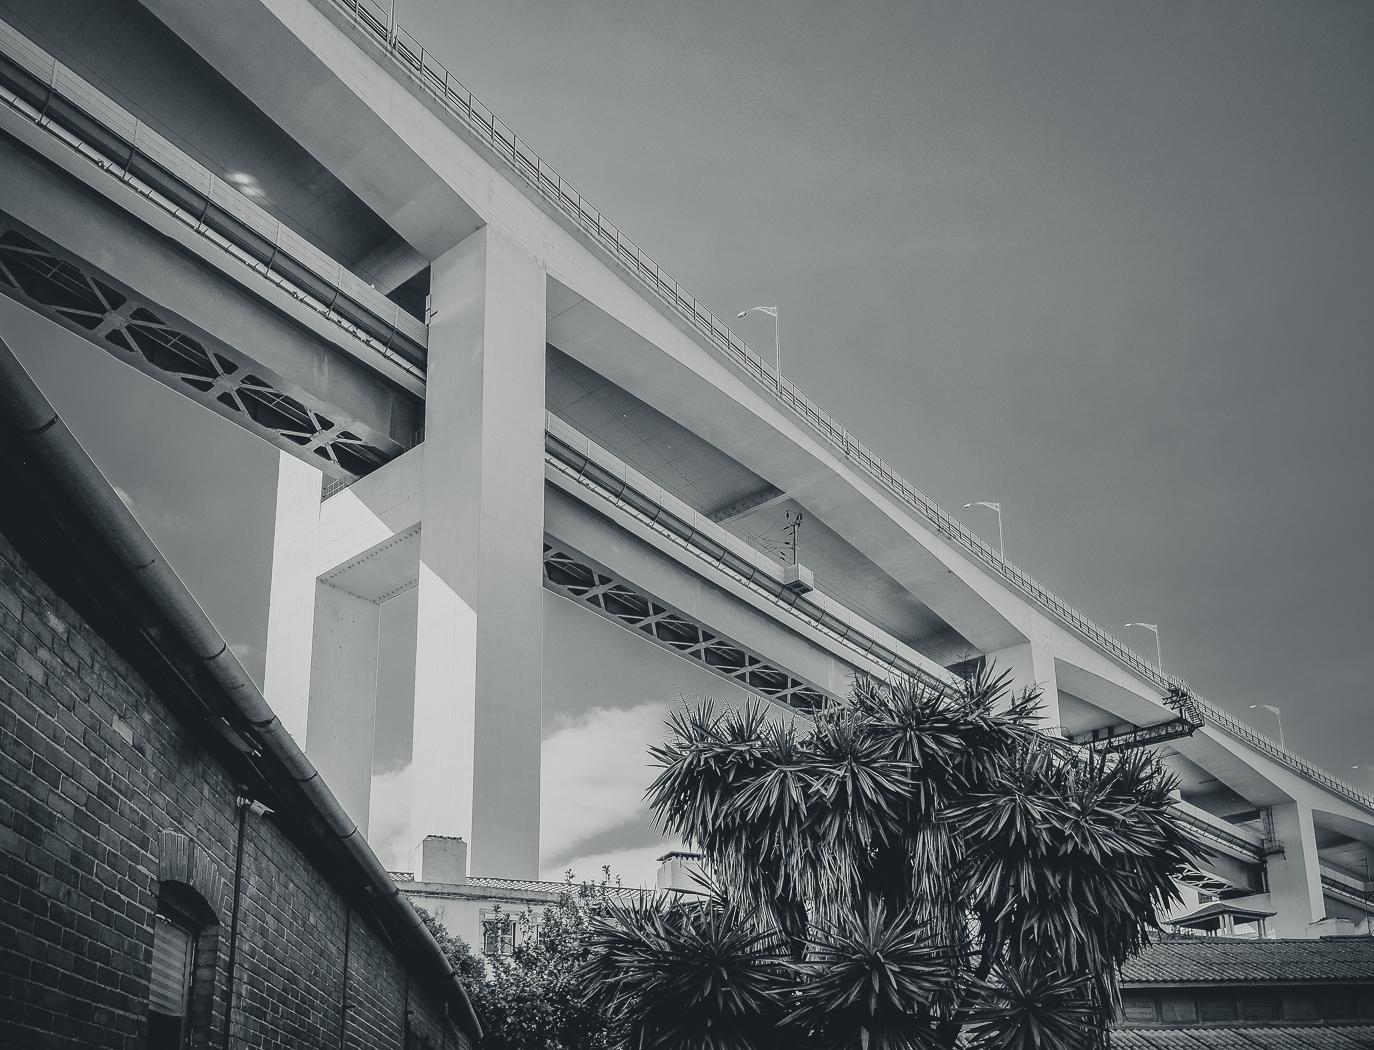 hb images - Ponte 25 - 1